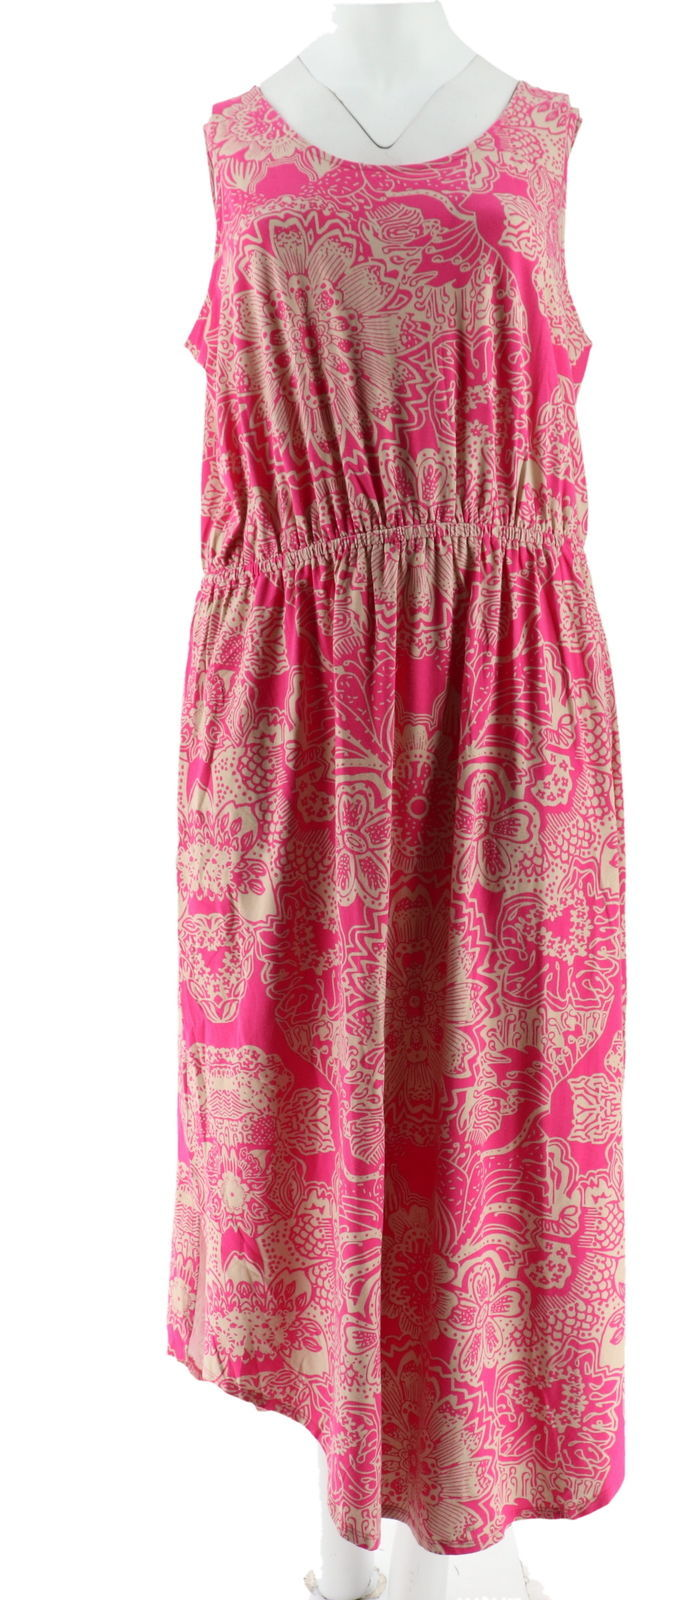 Liz Claiborne NY Rounded Hem Knit Maxi Dress Magenta Pink S NEW A254862